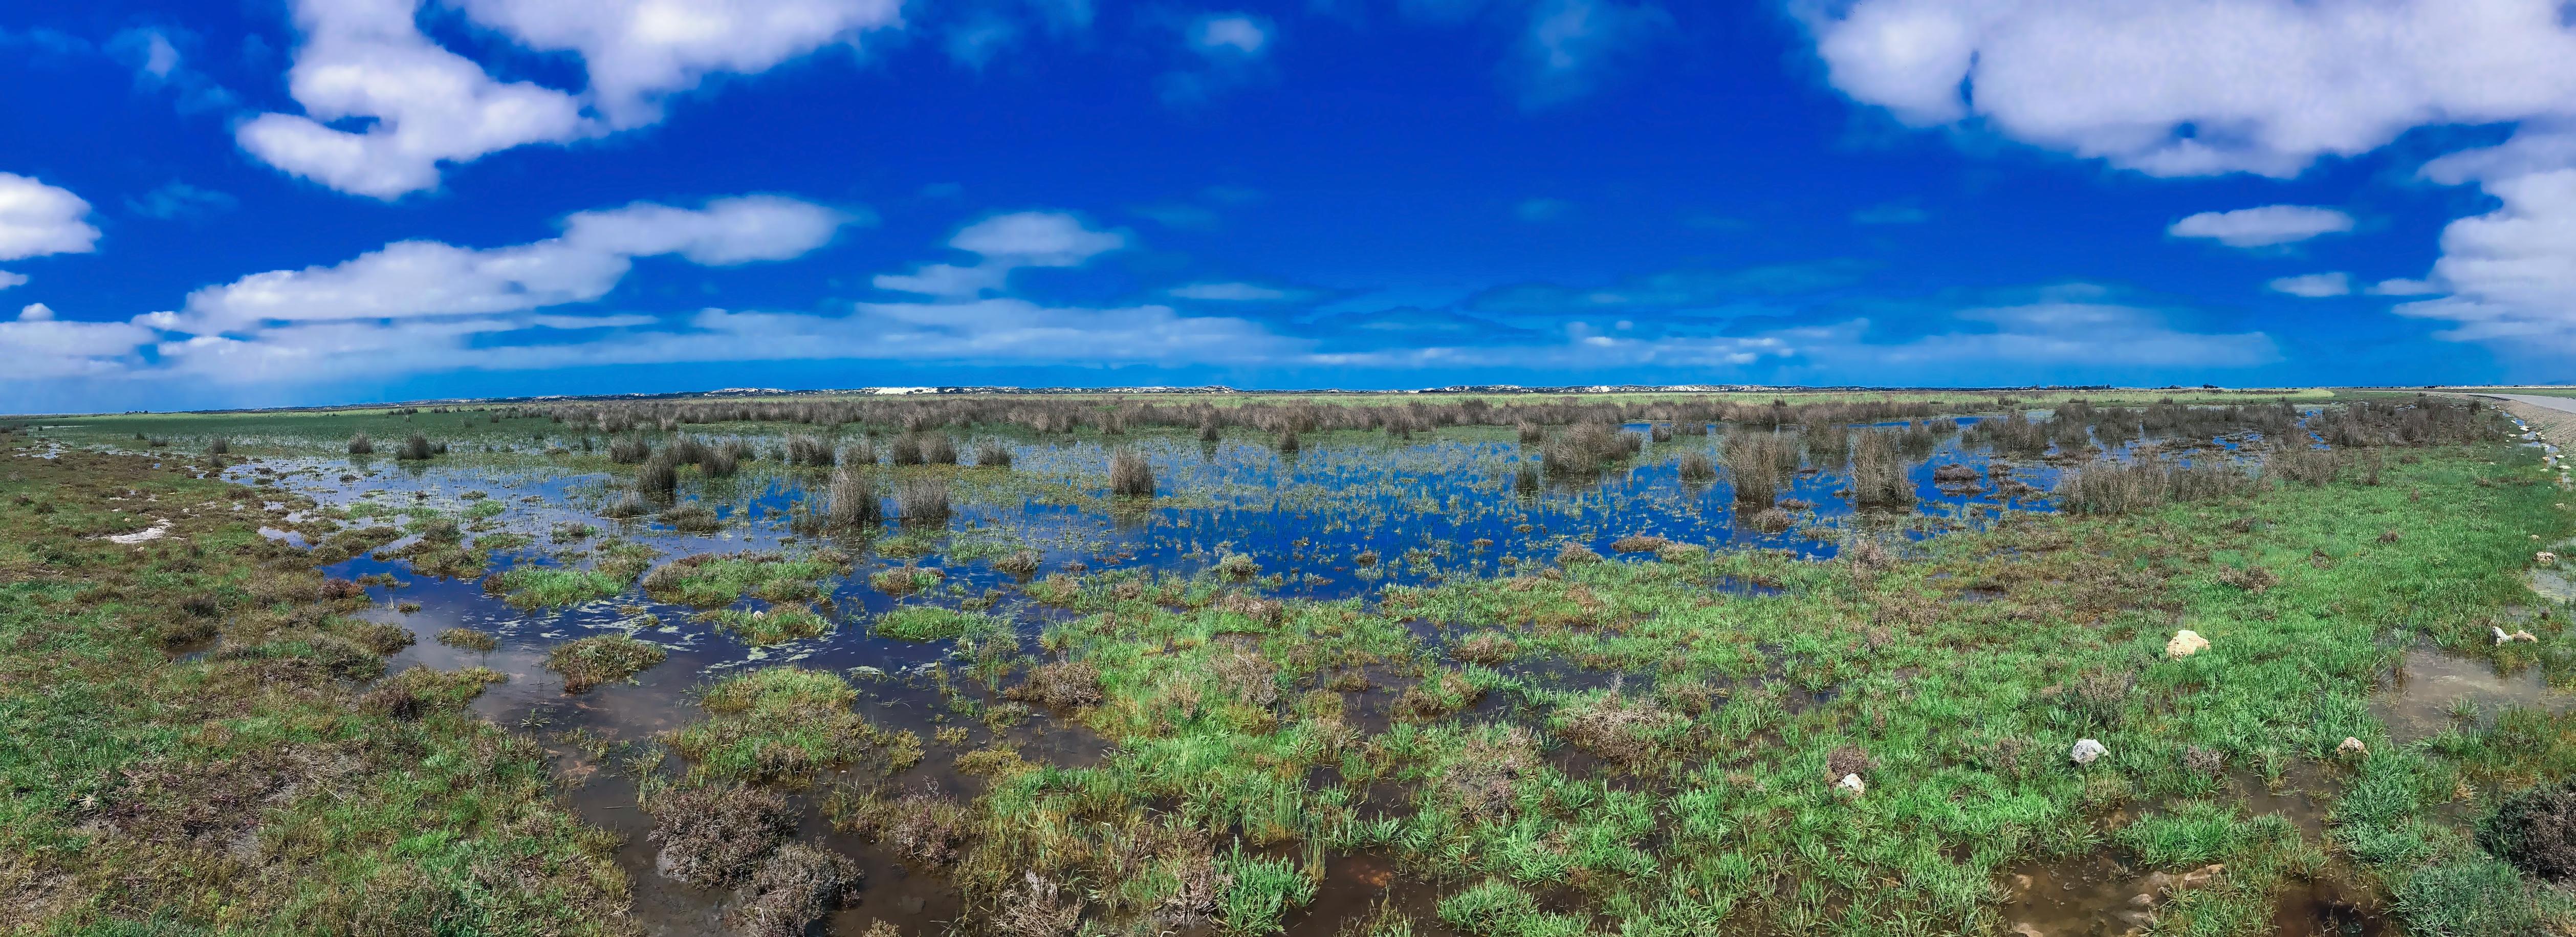 mundoo-wetland-hdr